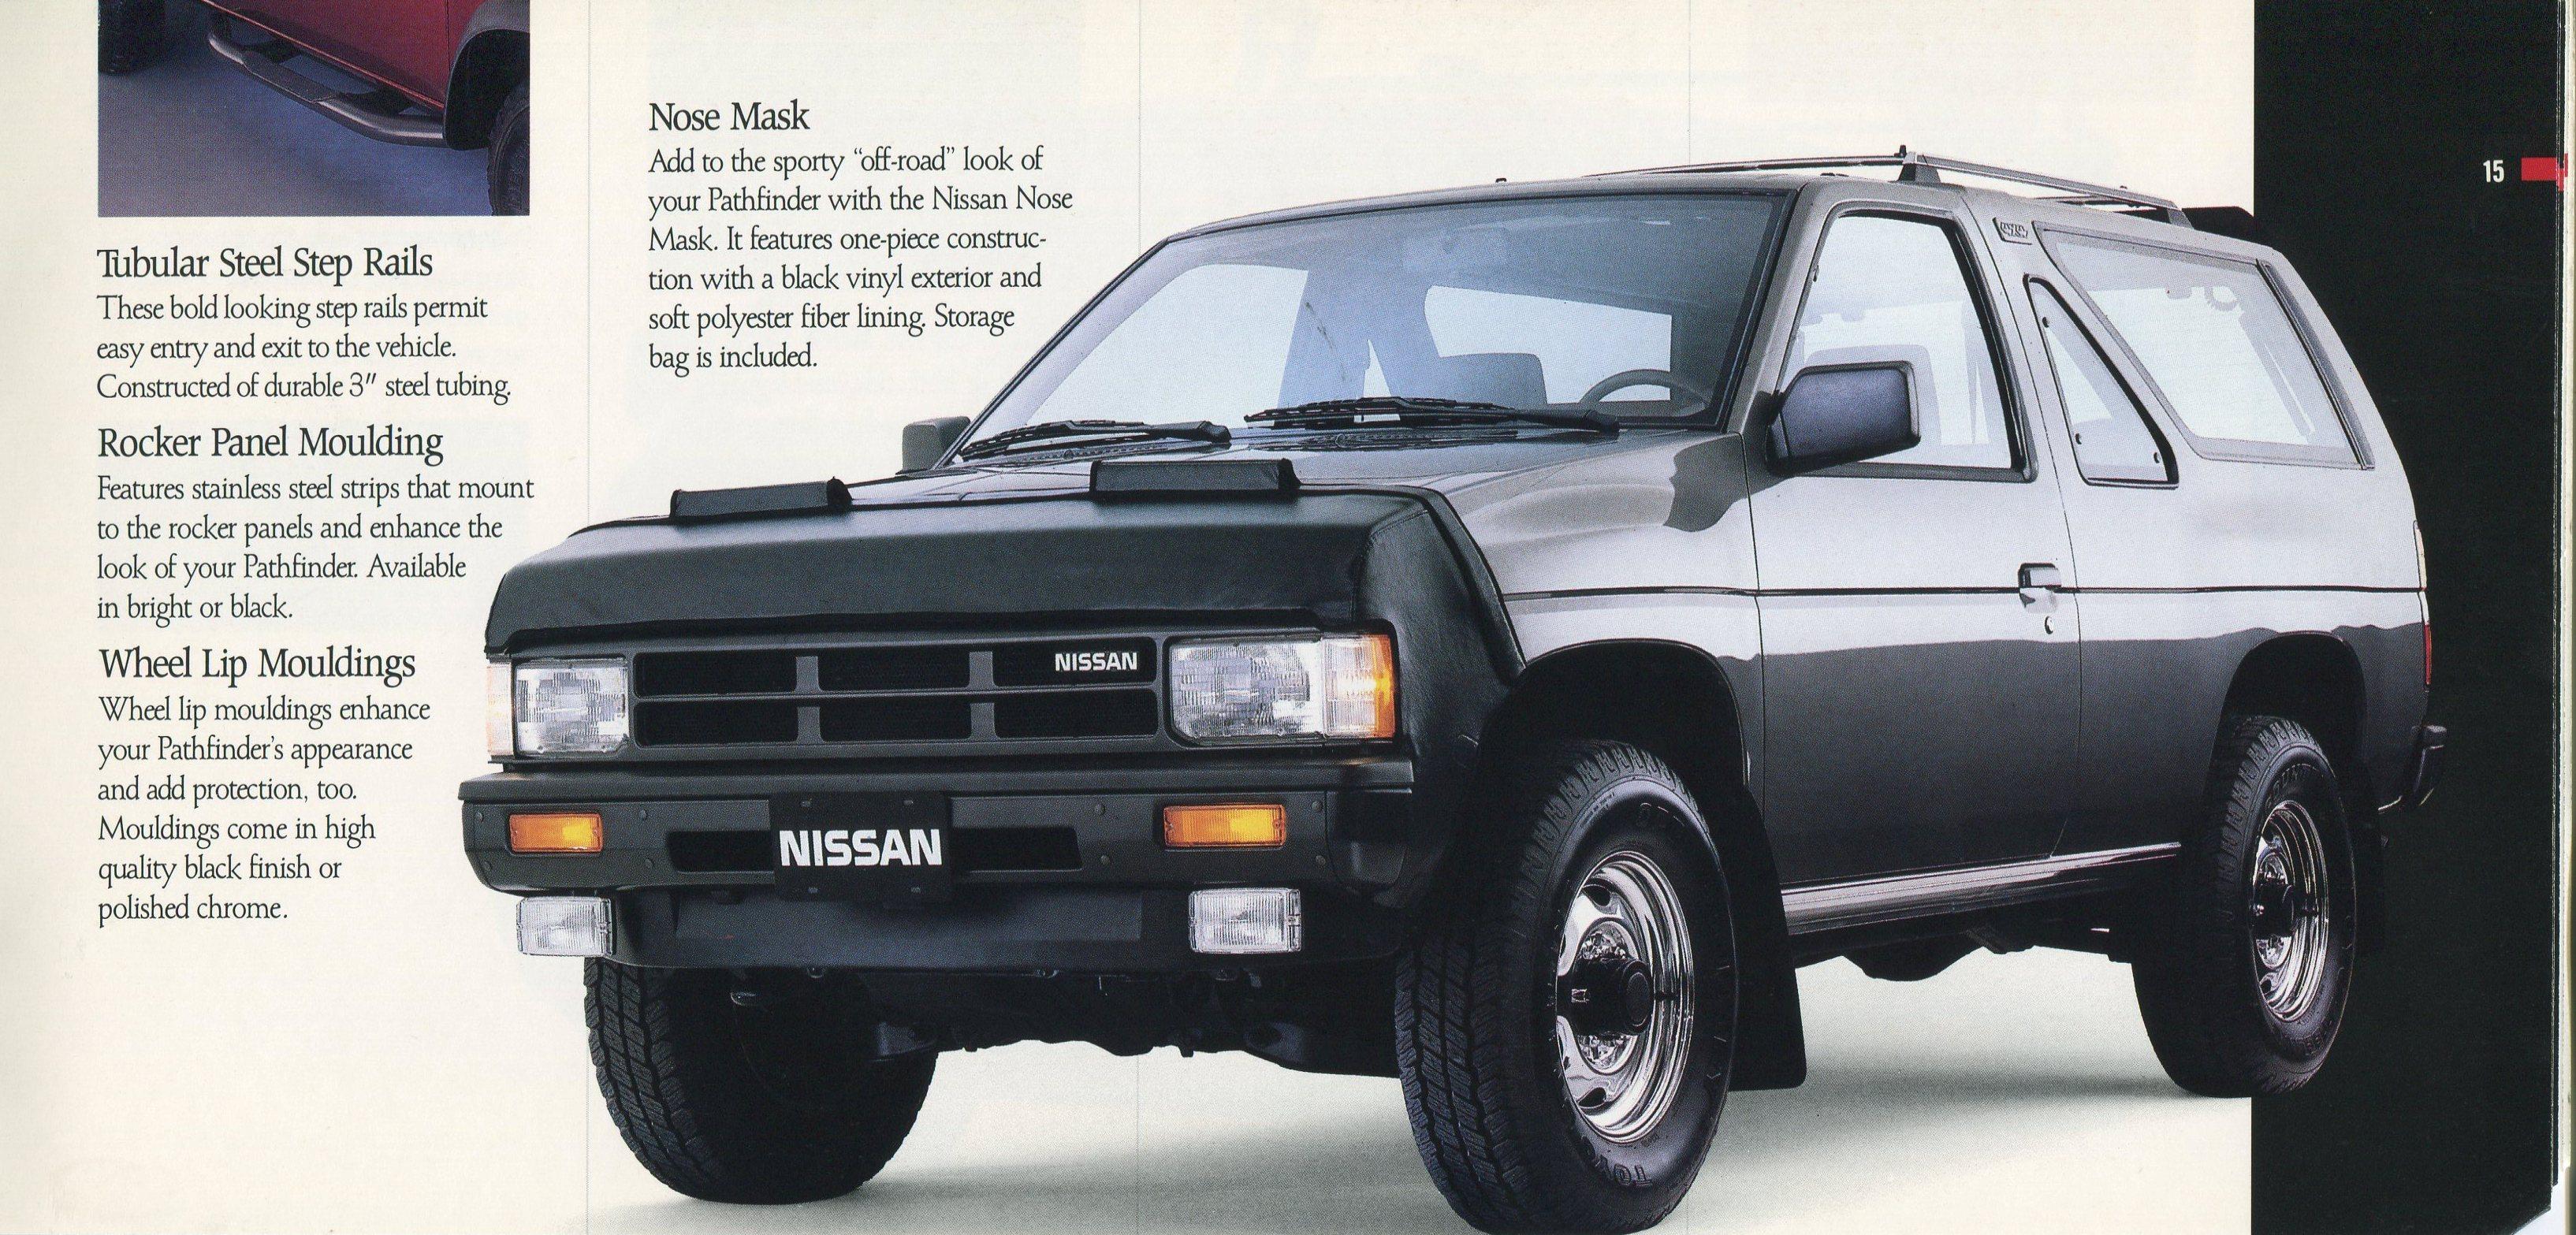 1988 Nissan Trucks Genuine Accessories Brochure Nicoclub